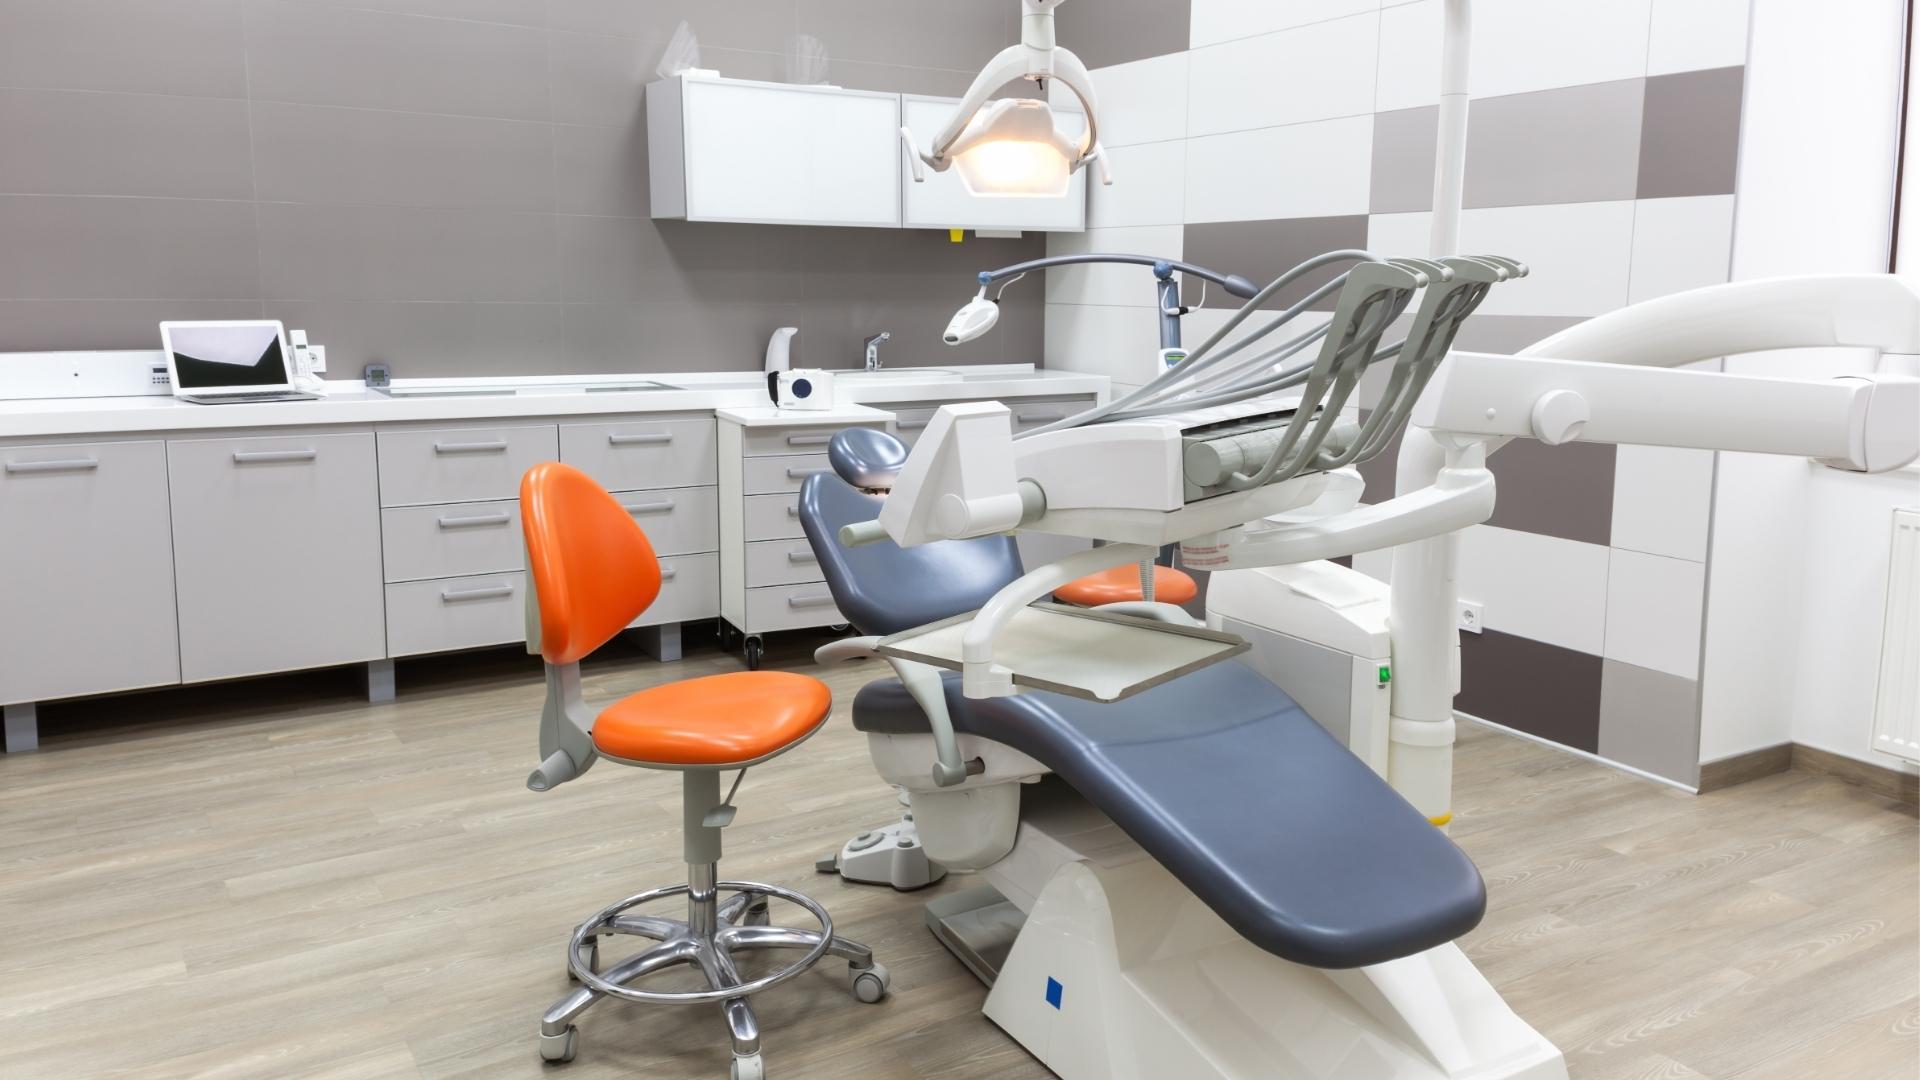 Dental office fitout